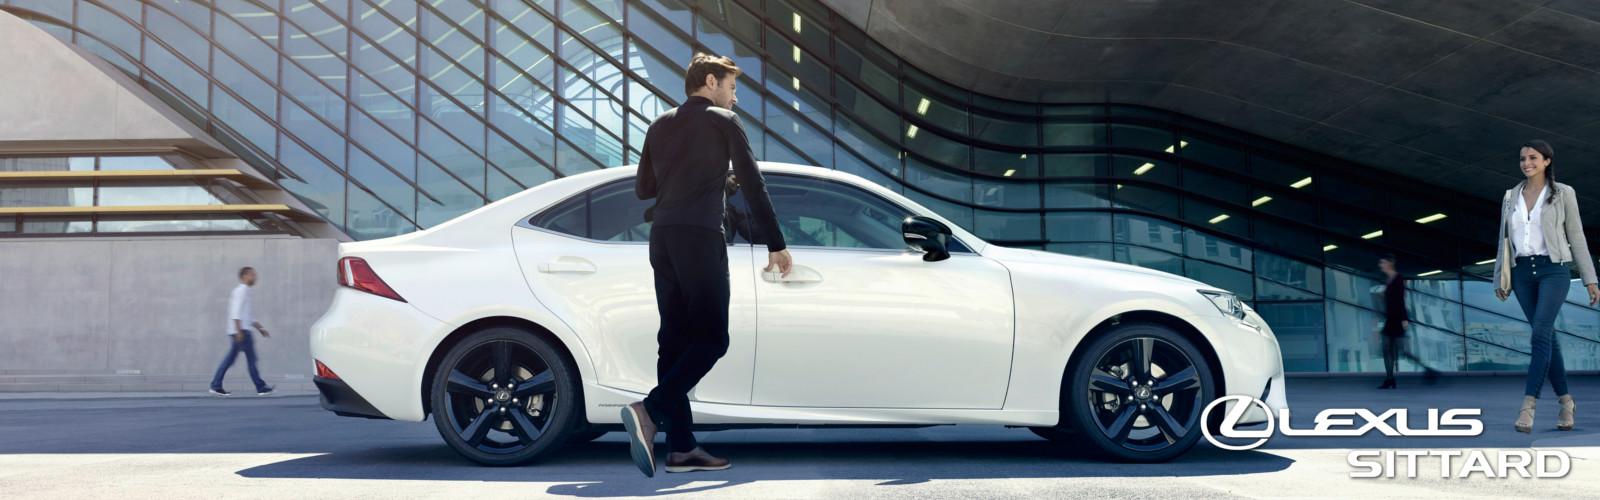 Proefrit en inruilvoorstel Lexus Sittard